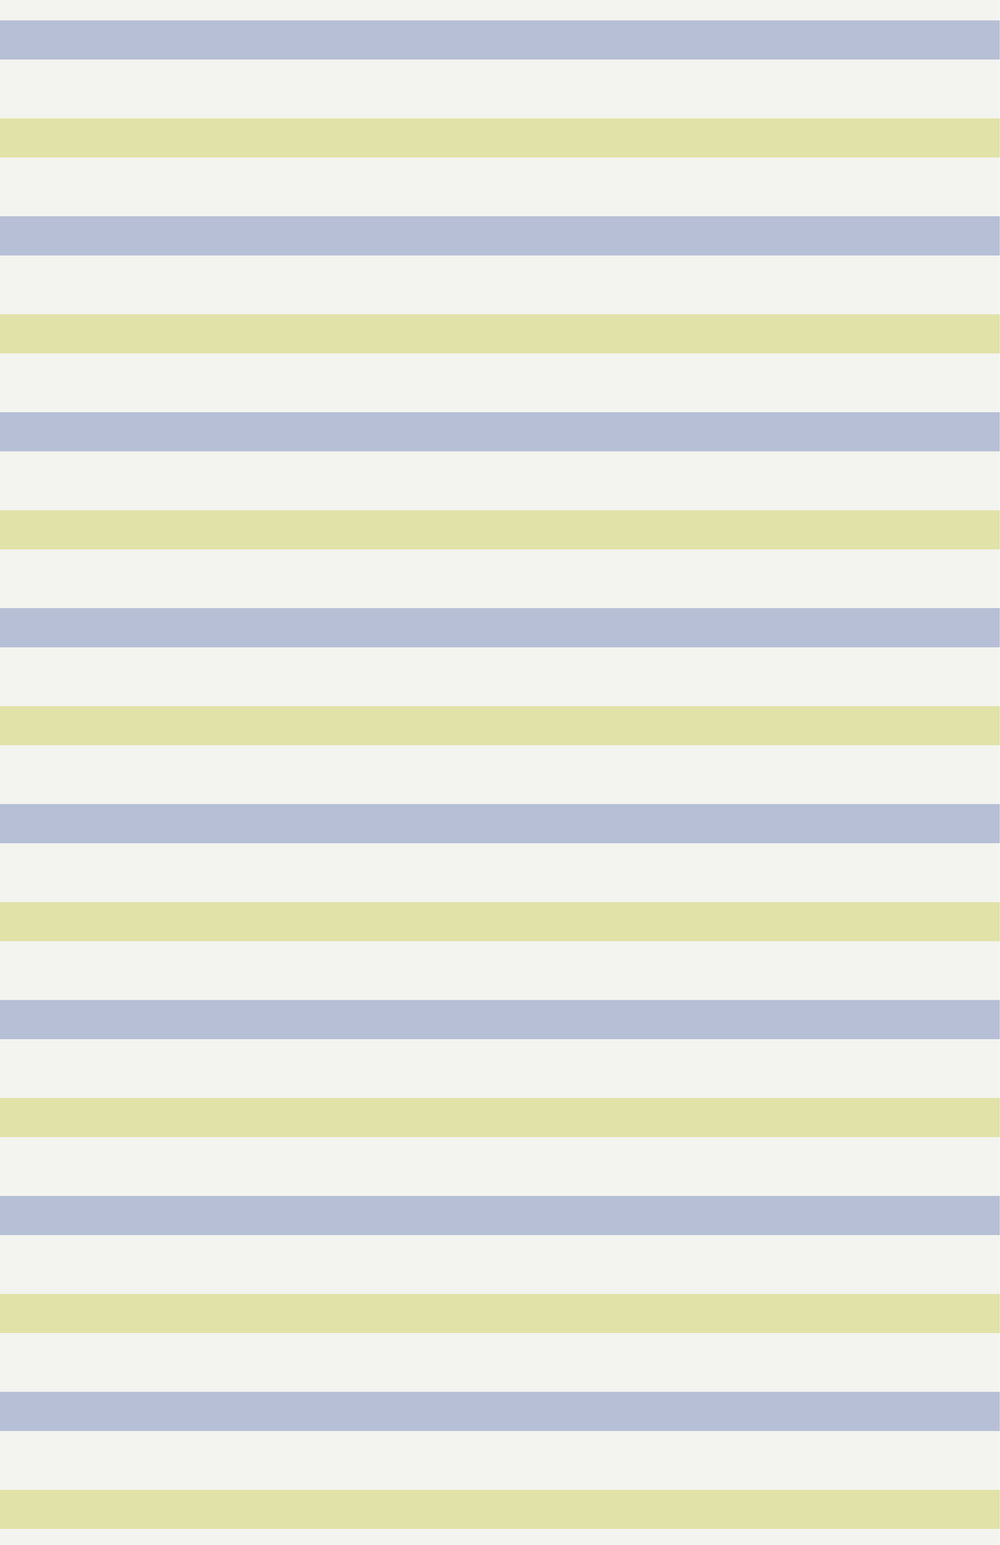 stripes-08.jpg